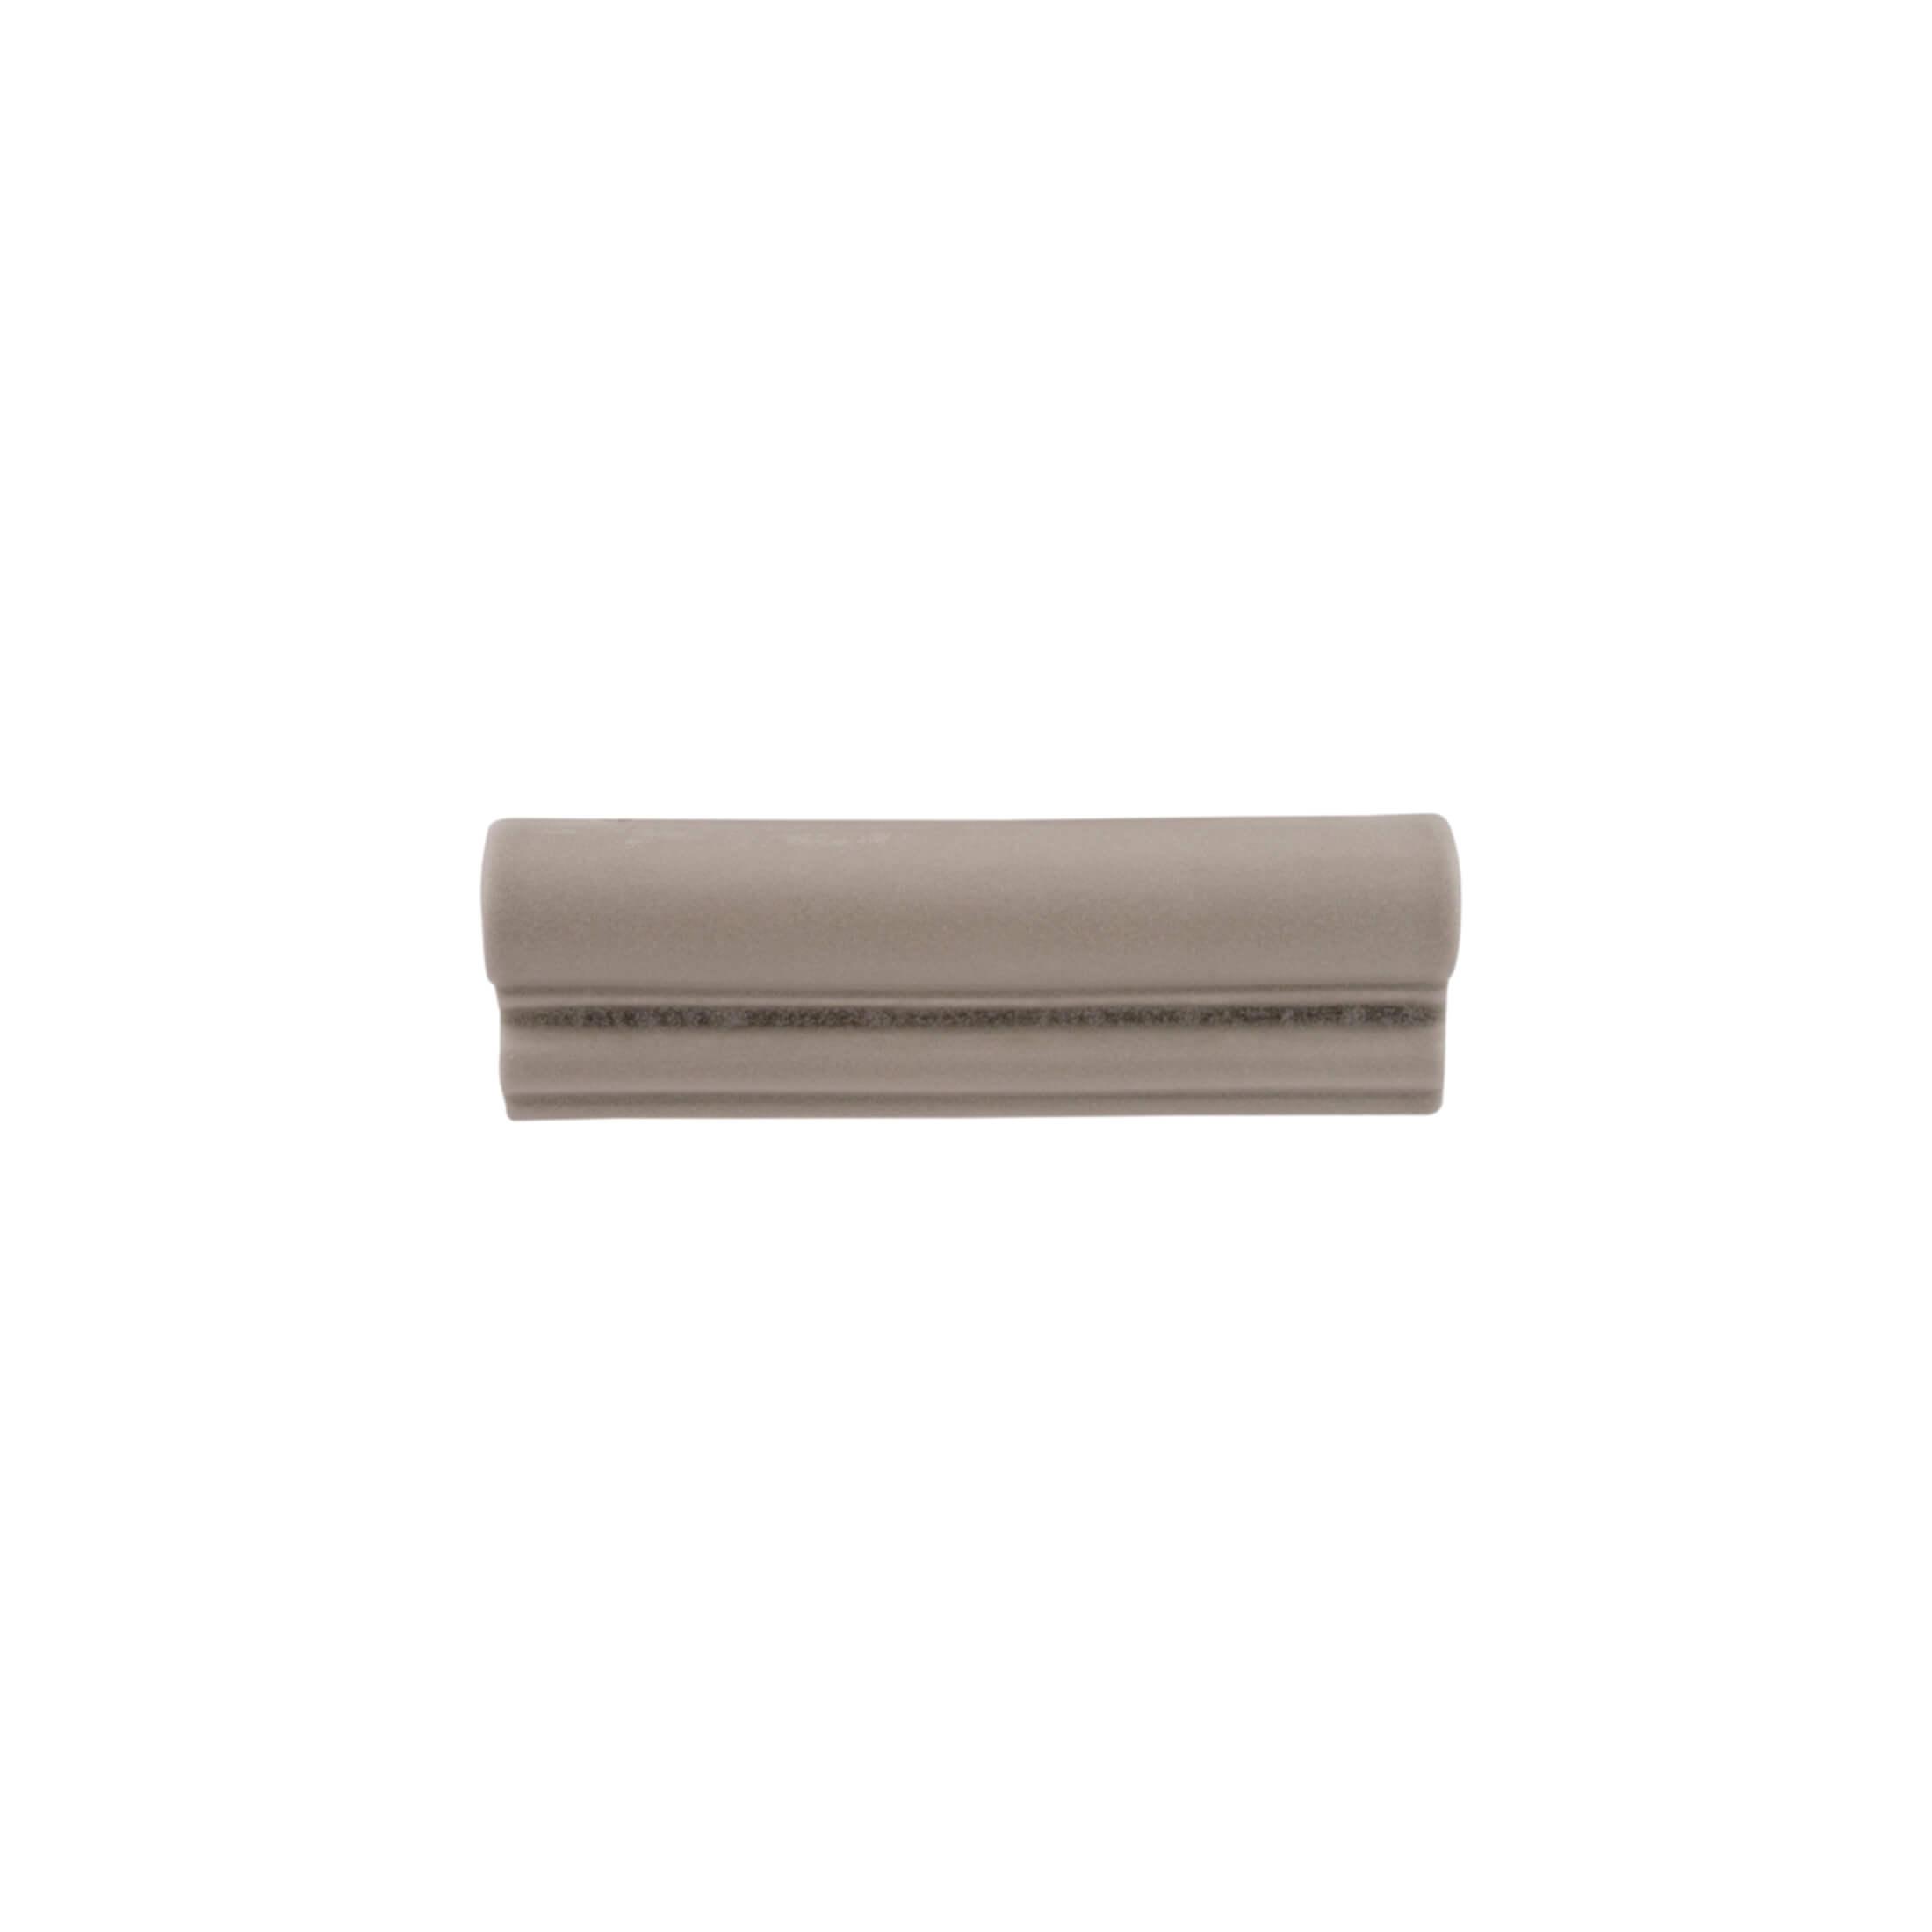 ADNT5002 - MOLDURA  - 5 cm X 15 cm